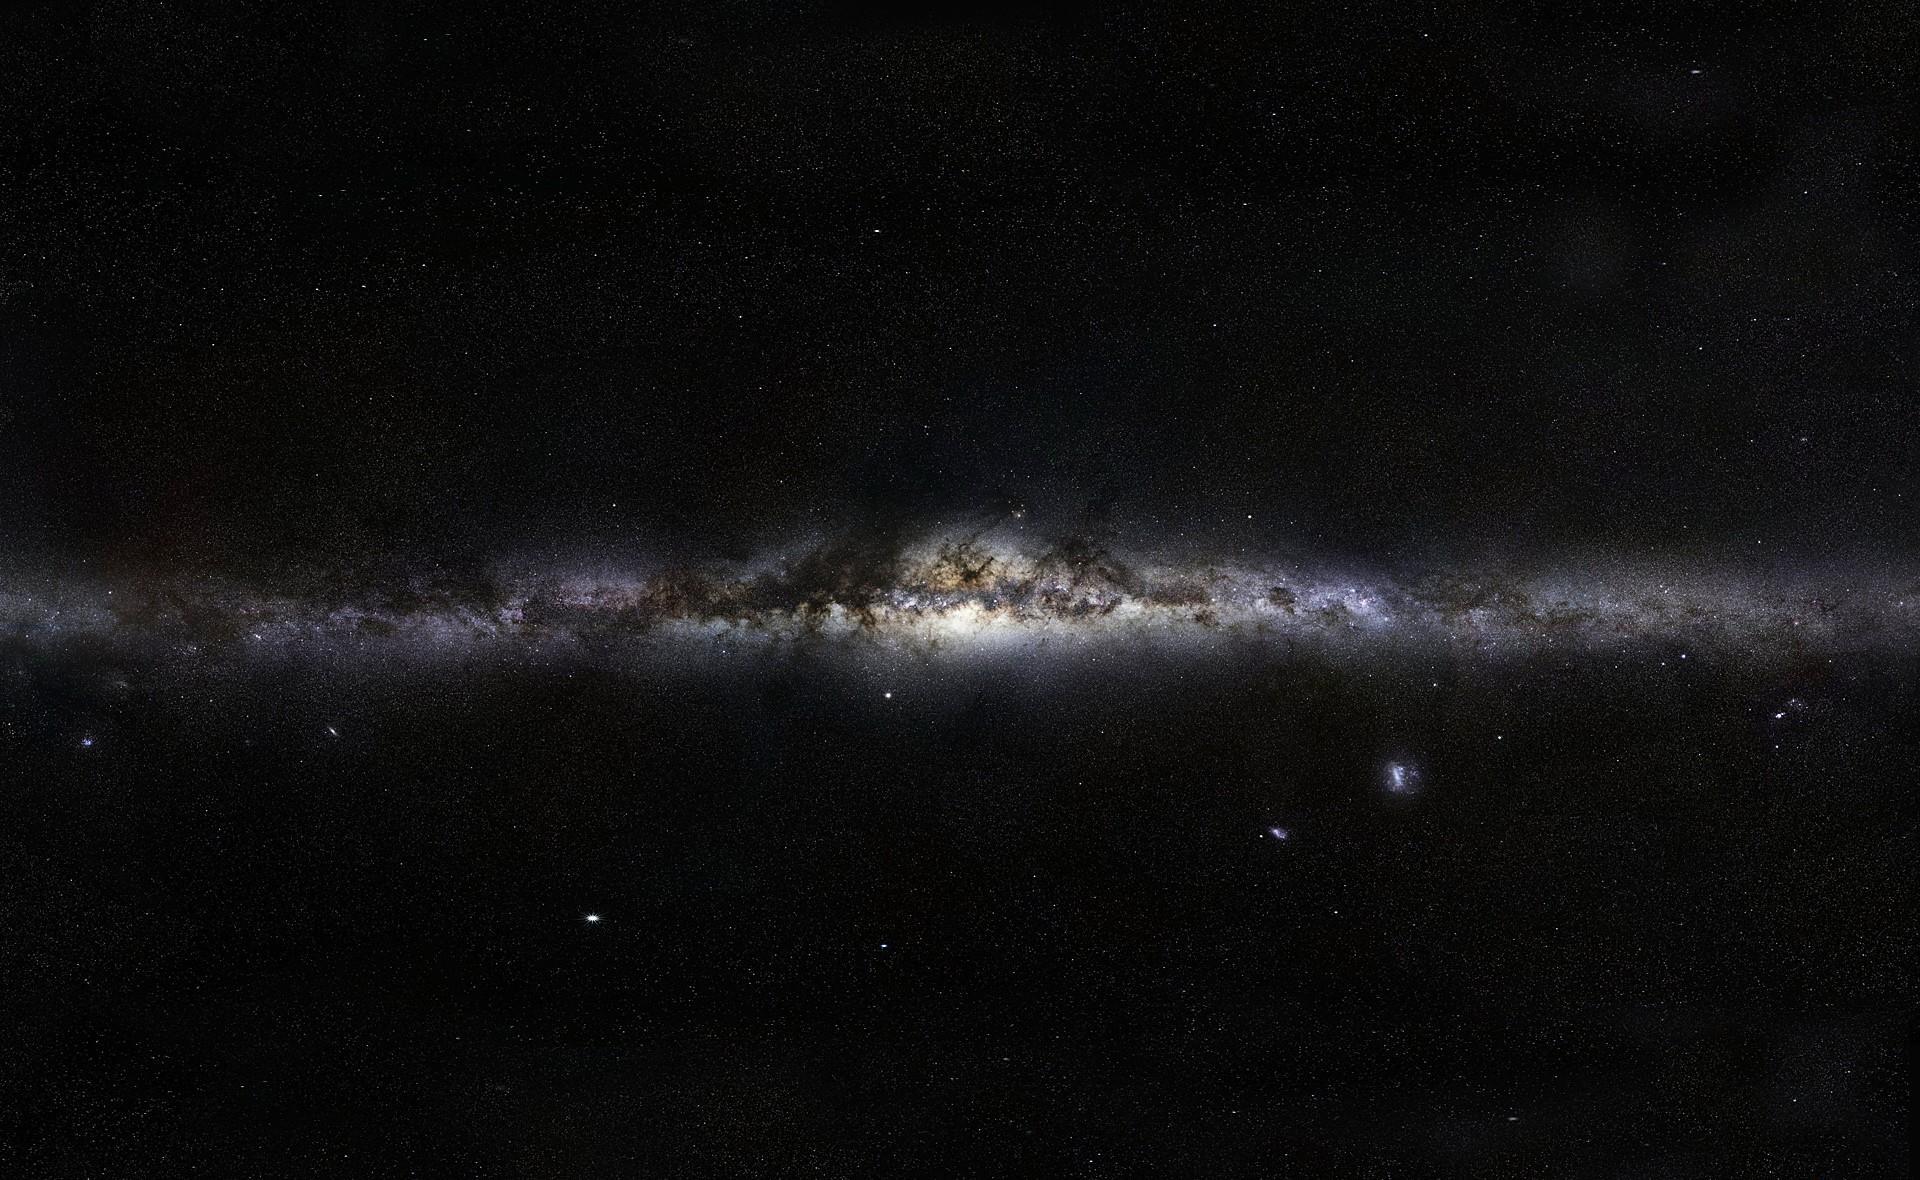 Night Galaxy Space Sky Stars Milky Way Nebula Atmosphere Spiral Astronomy Midnight Star Darkness Outer